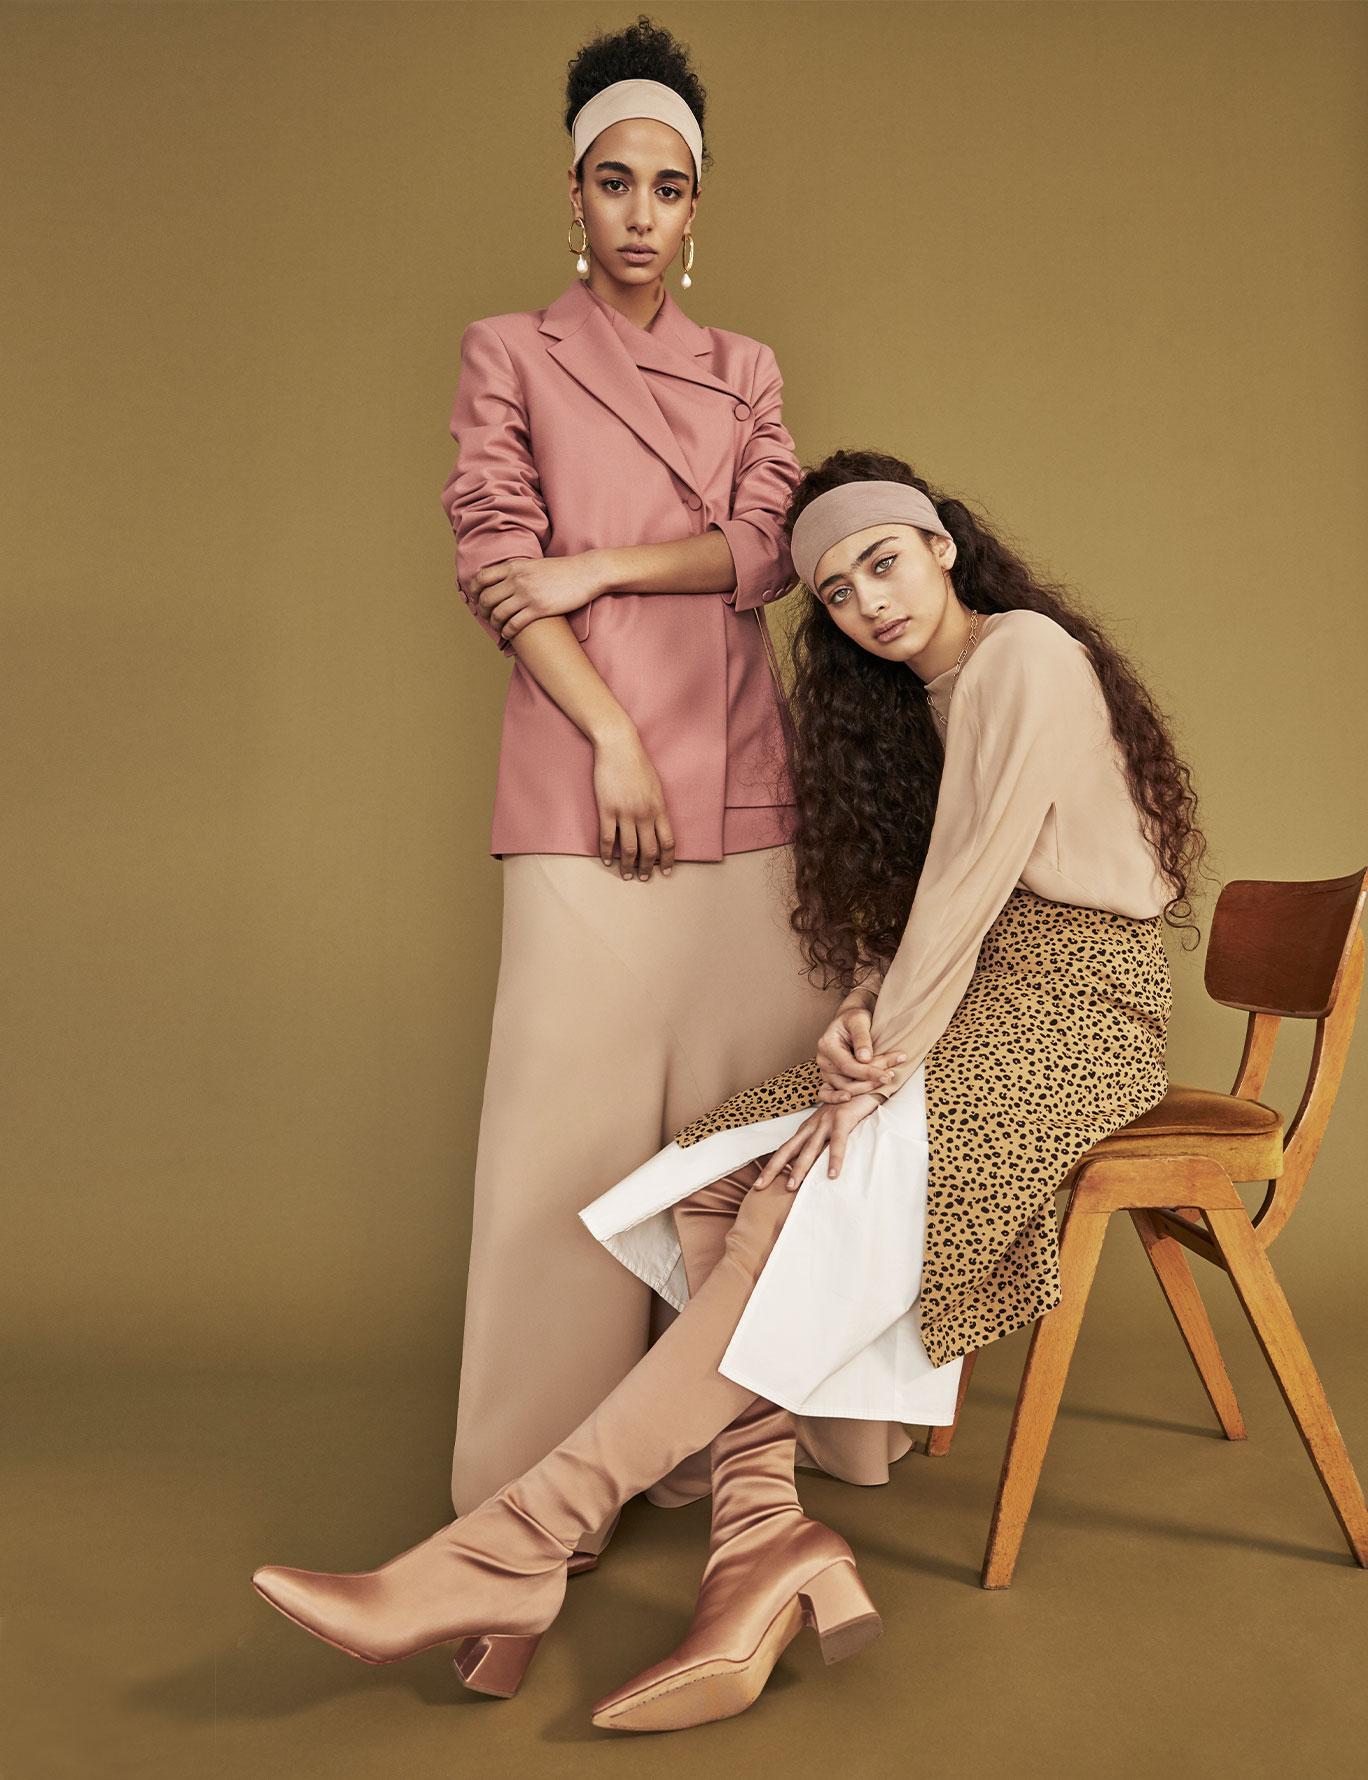 the-modist-fashion-shoot.jpg